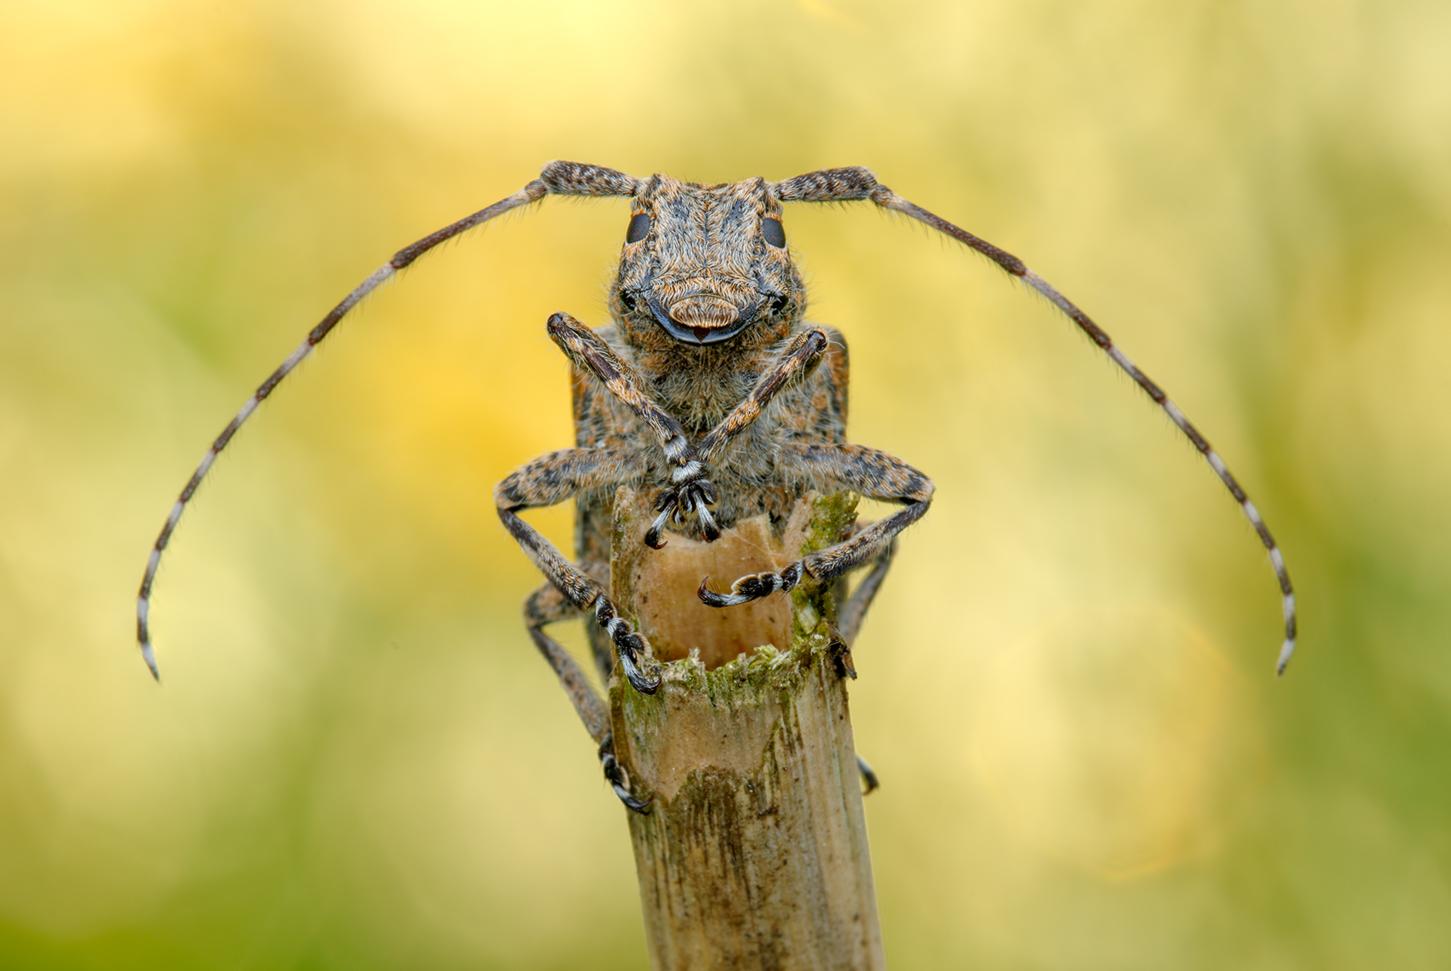 ... bock auf Käfer